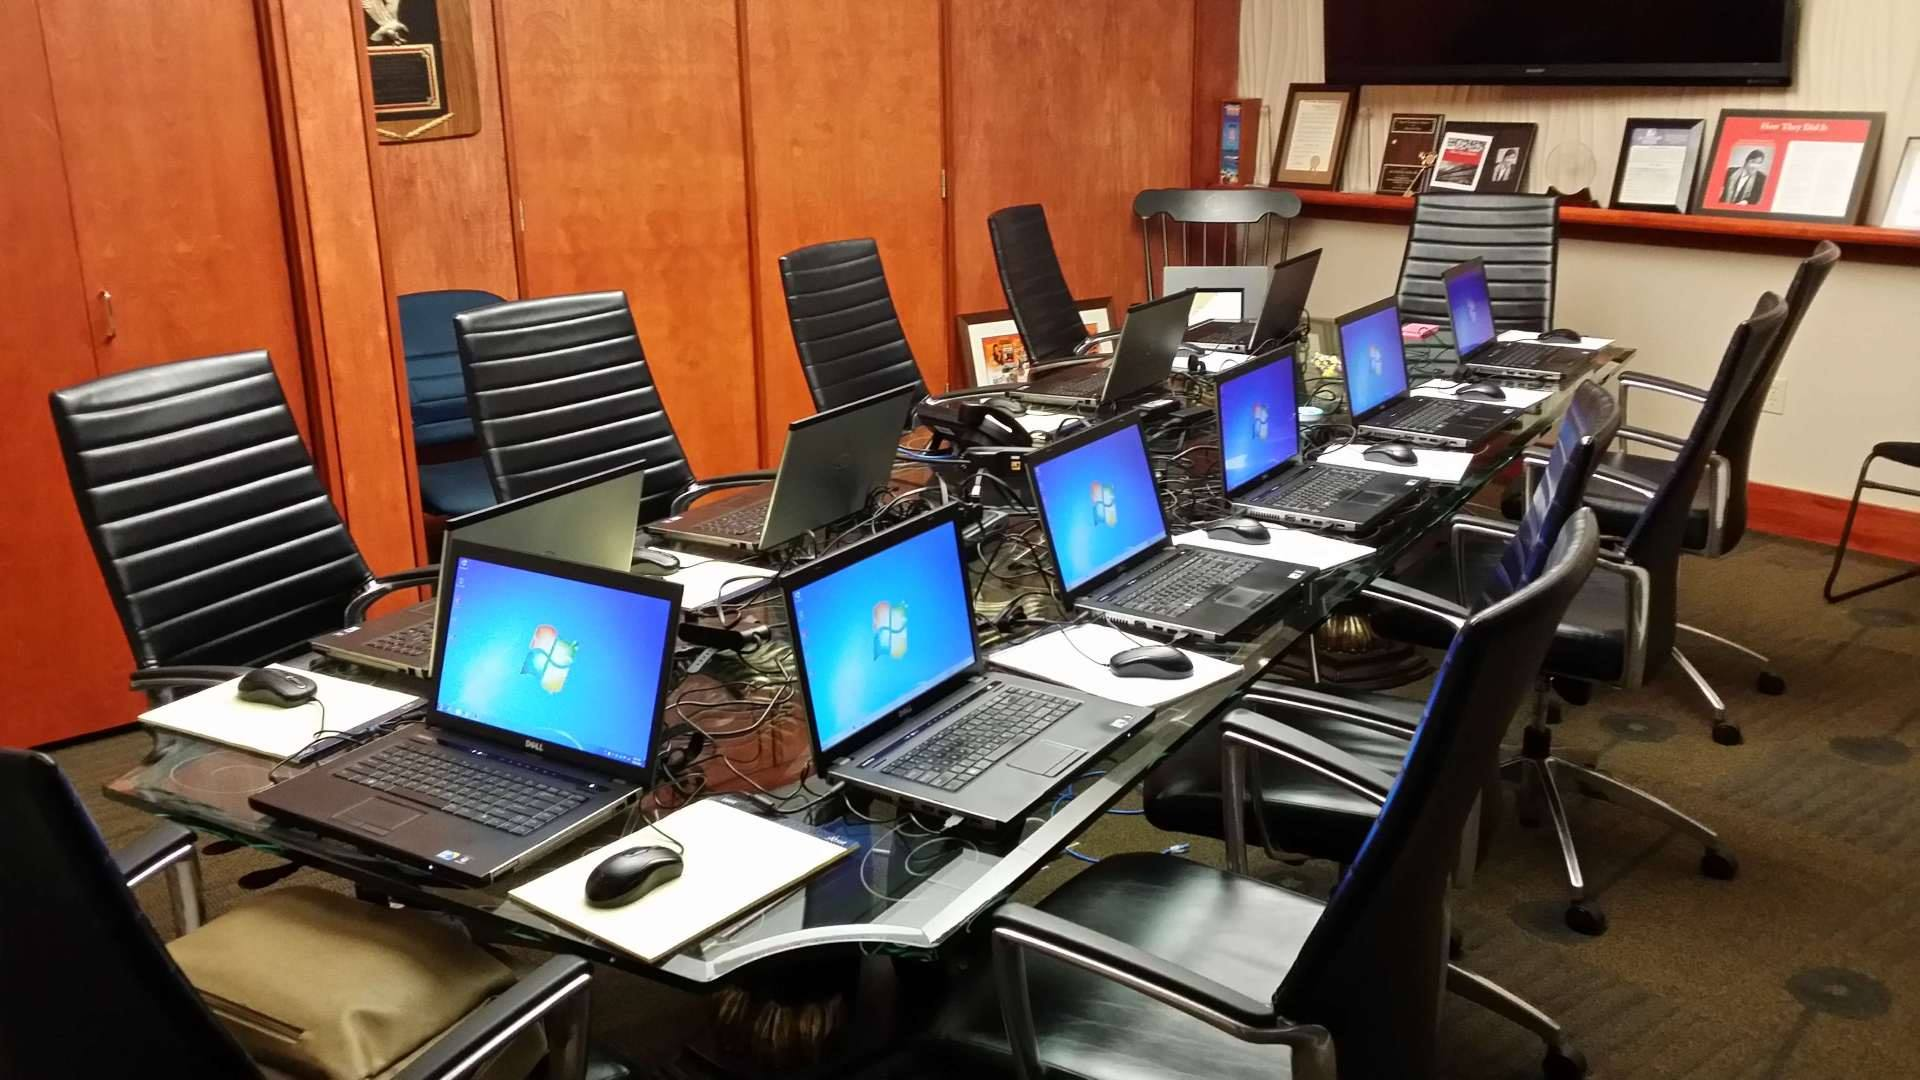 Computer  AV Rentals for Businesses  Events 8007368772